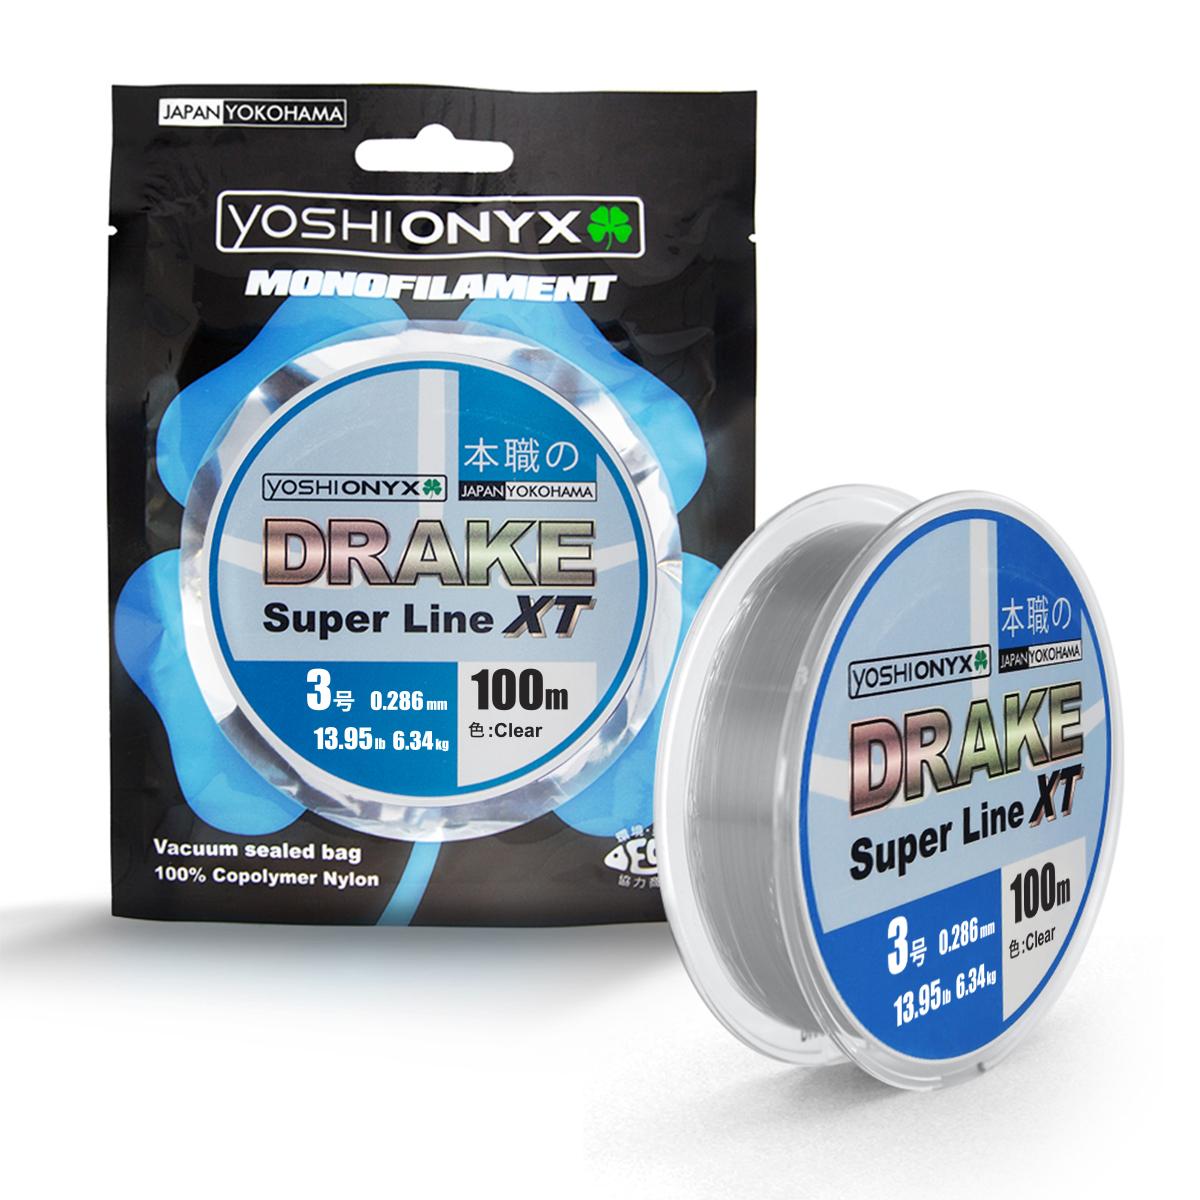 Леска Yoshi Onyx Drake Superline XT, цвет: прозрачный, 100 м, 0,286 мм, 6,34 кг леска yoshi onyx drake fluoro цвет прозрачный 100 м 0 21 мм 3 08 кг